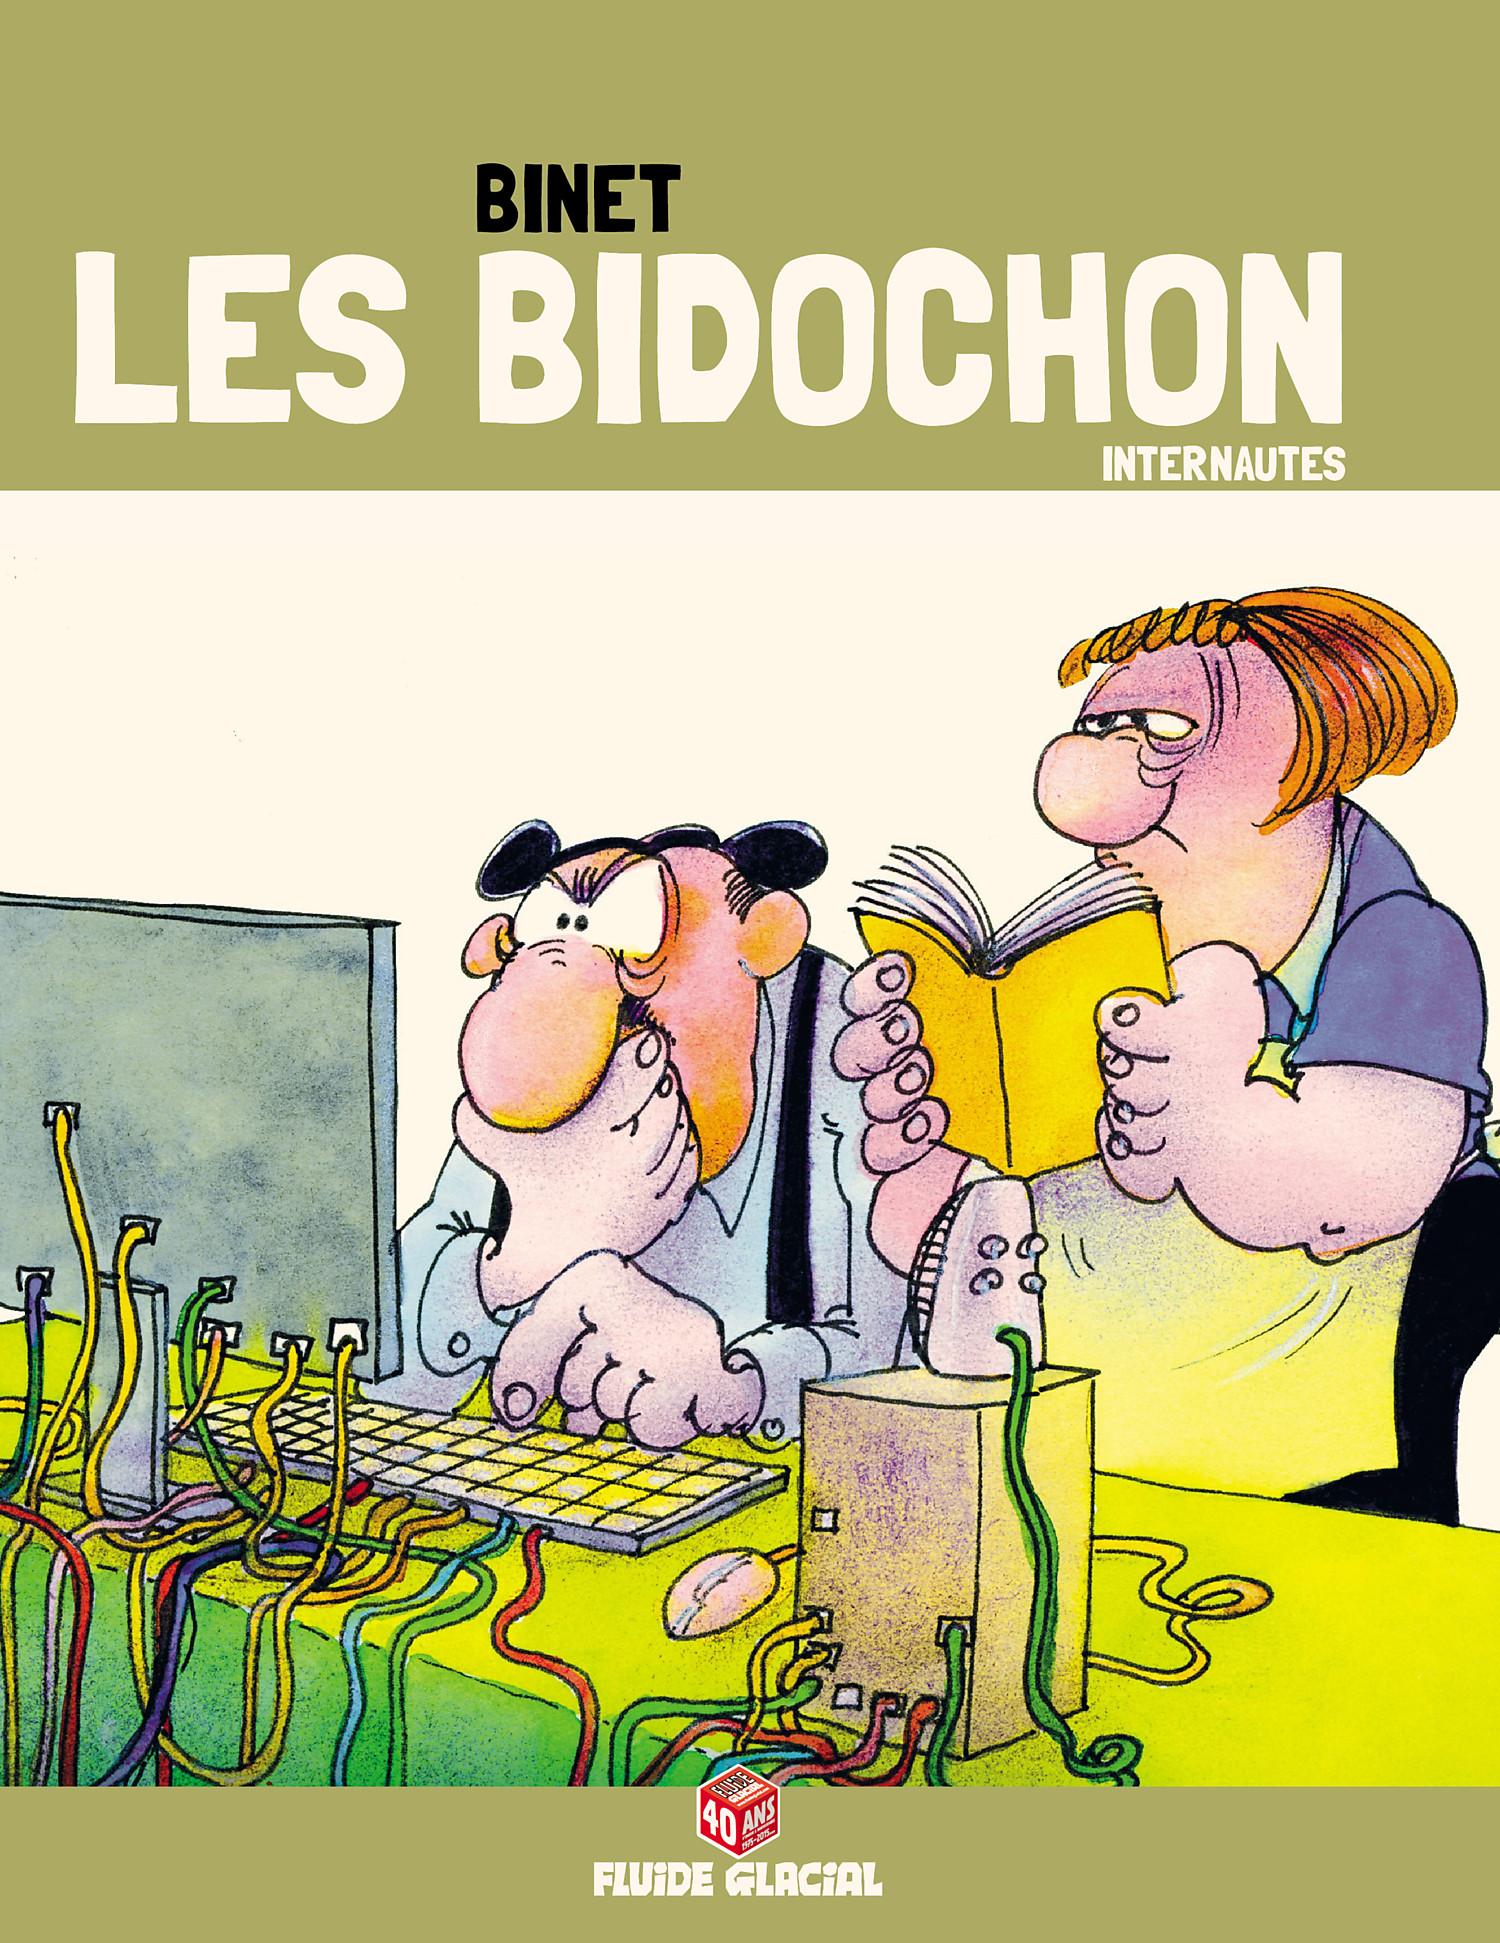 Les Bidochon (Tome 19) - Internautes (édition COLLECTOR) |